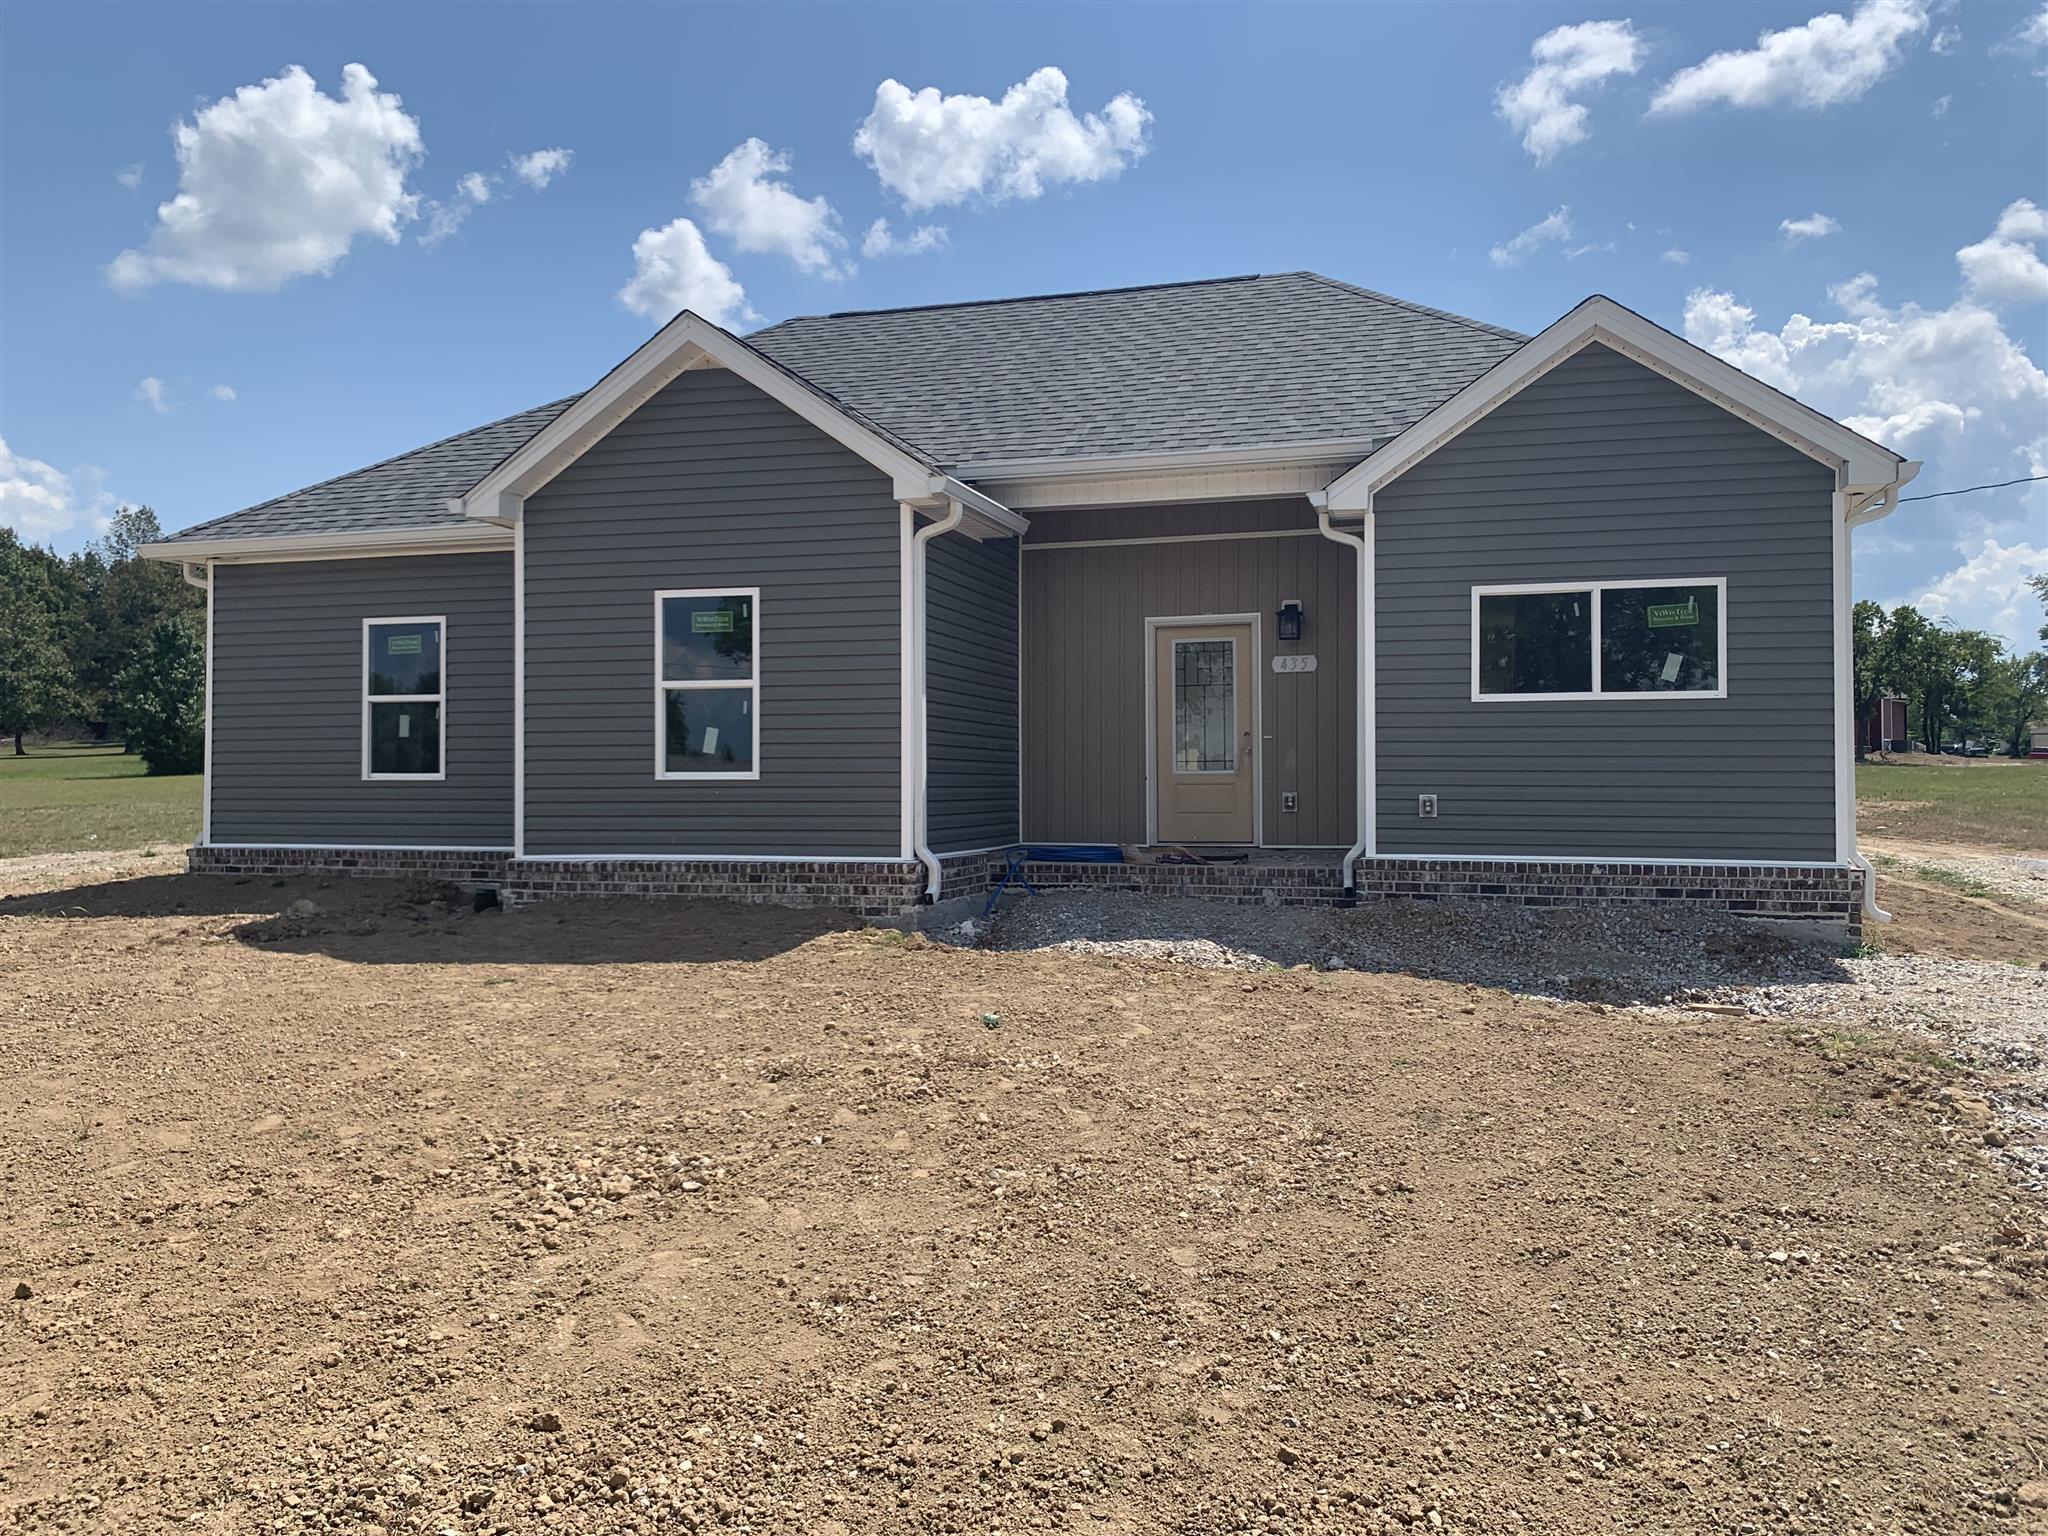 435 Darnell Mealer Rd, Lewisburg, TN 37091 - Lewisburg, TN real estate listing